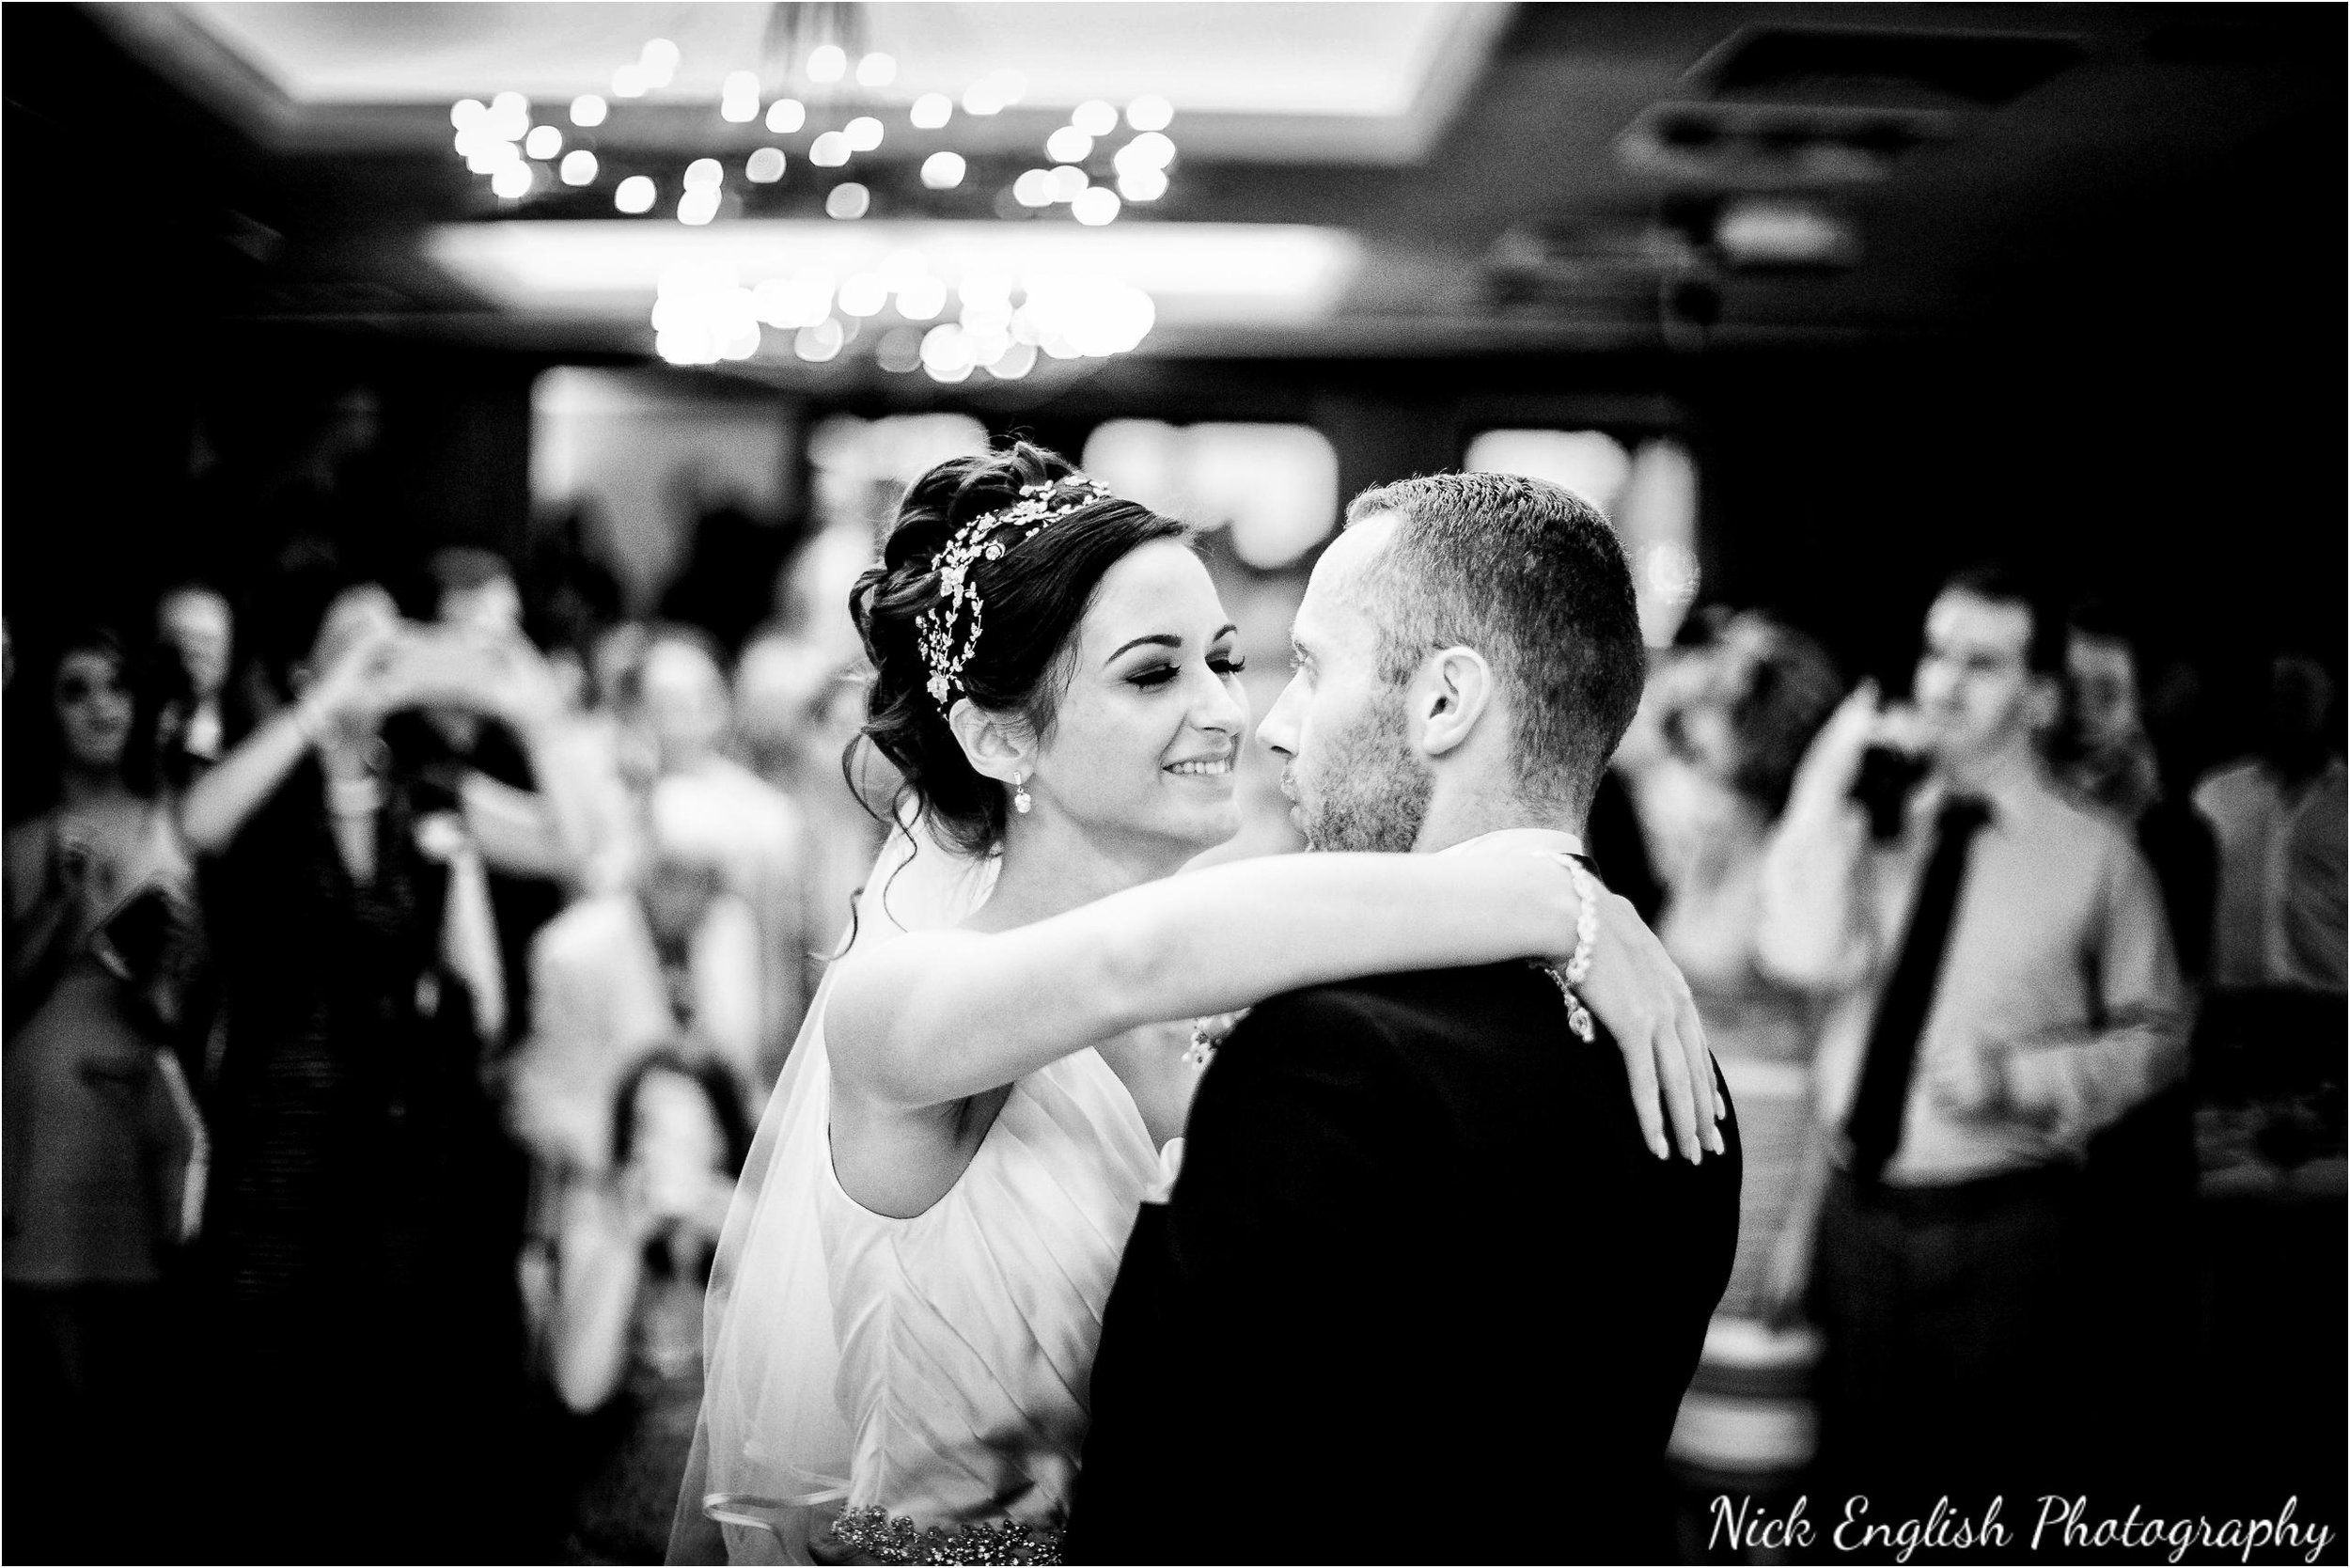 Emily David Wedding Photographs at Barton Grange Preston by Nick English Photography 223jpg.jpeg